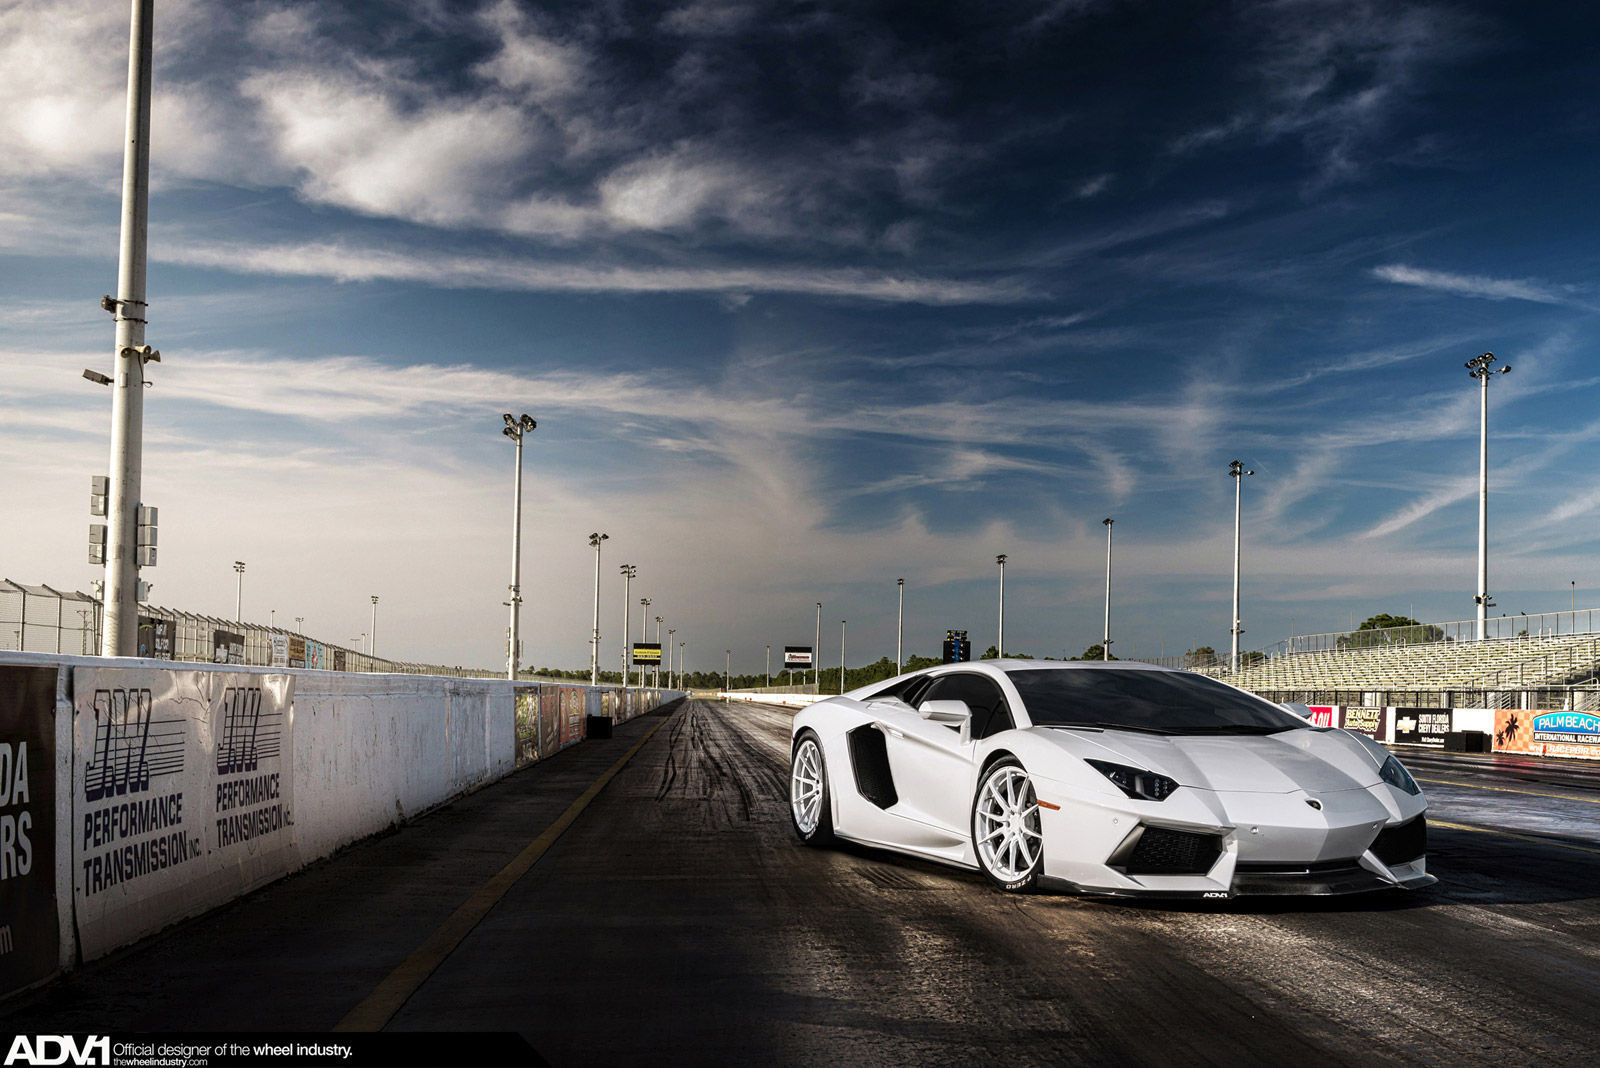 2014 Lamborghini Aventador | Lamborghini Aventador on ADV10 CS